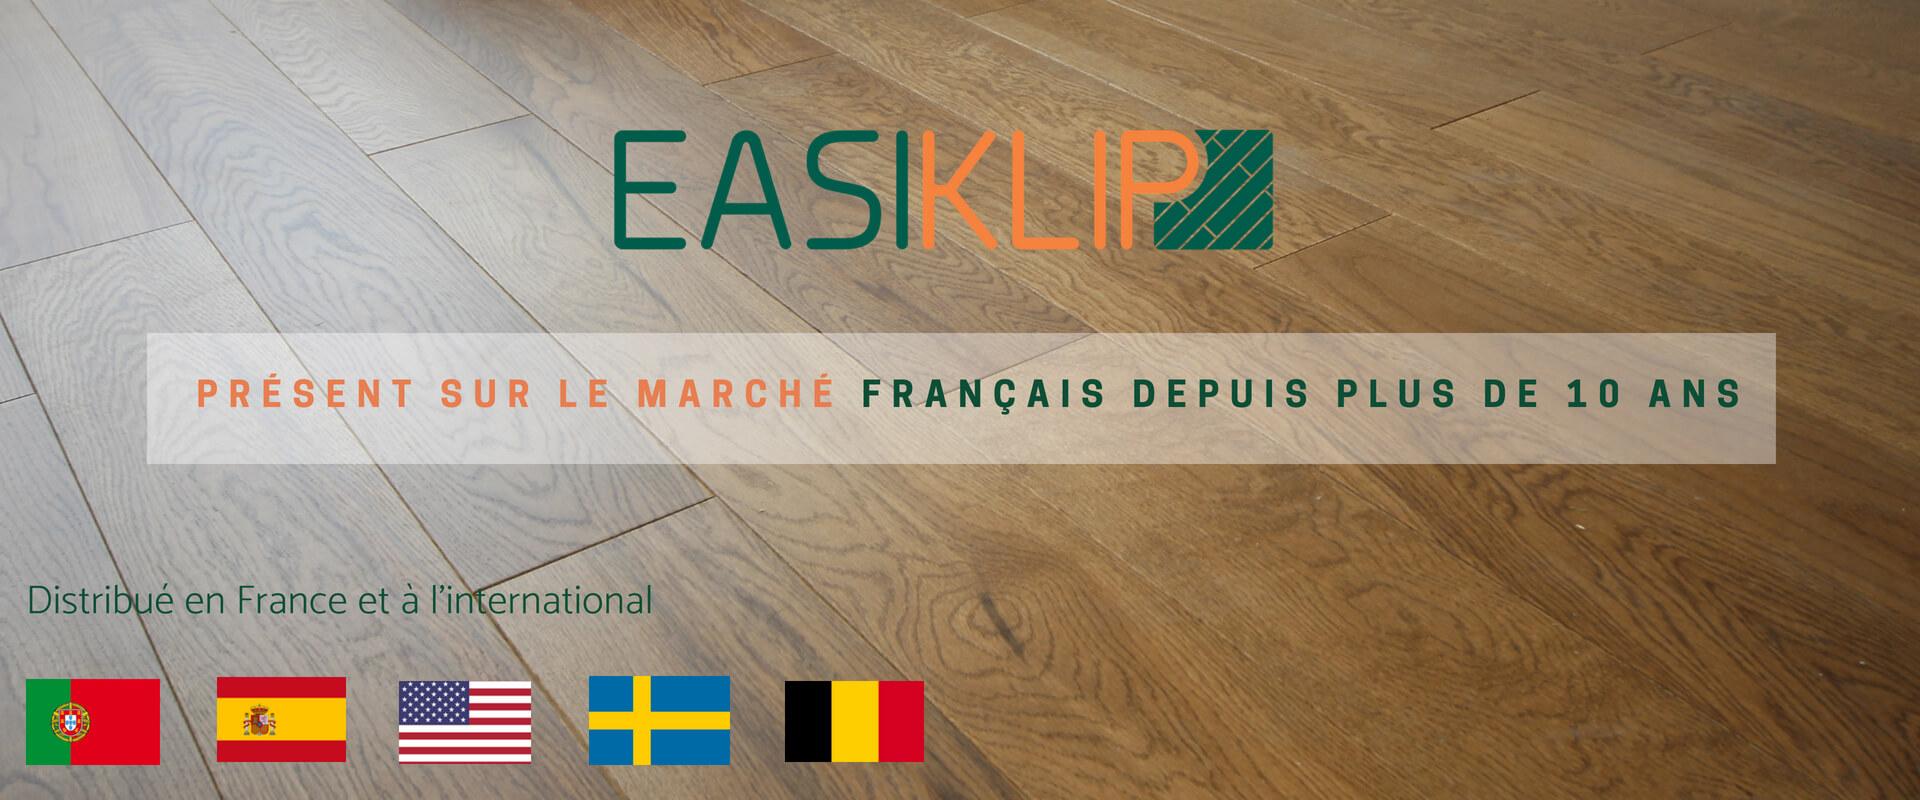 slider EASIKLIP Europe